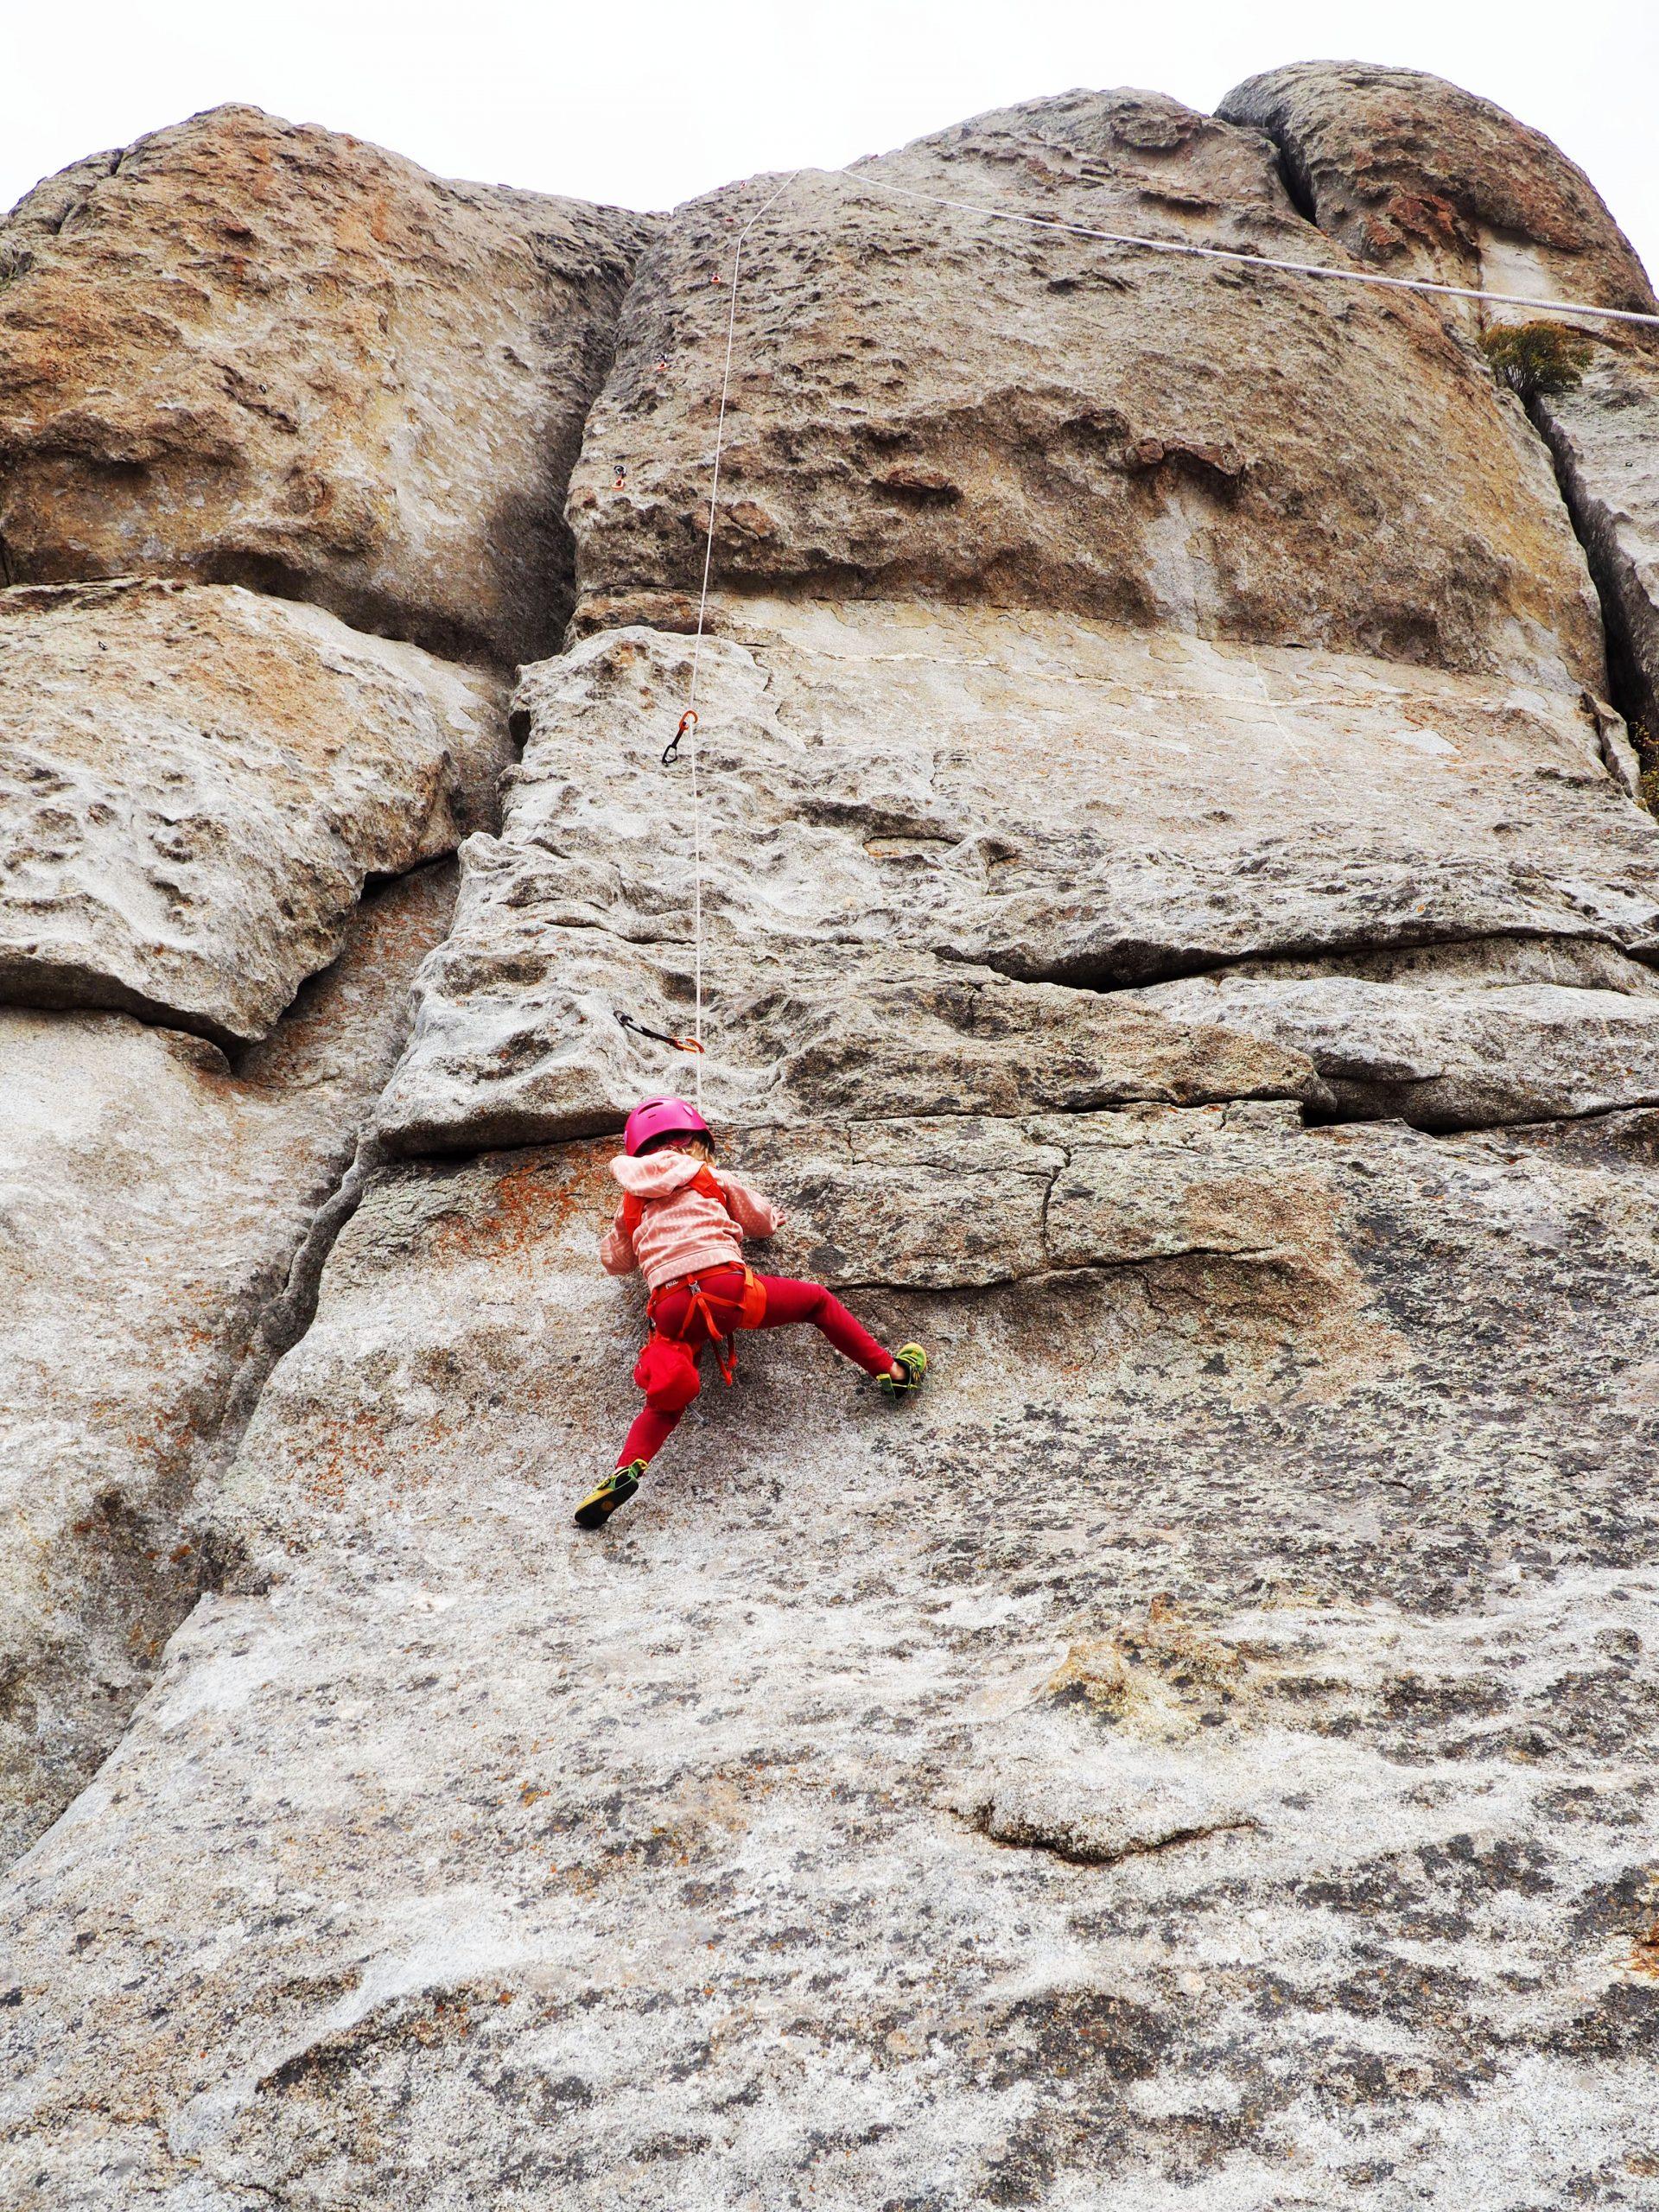 Climbing Gear for Kids The Macchu by Petzl